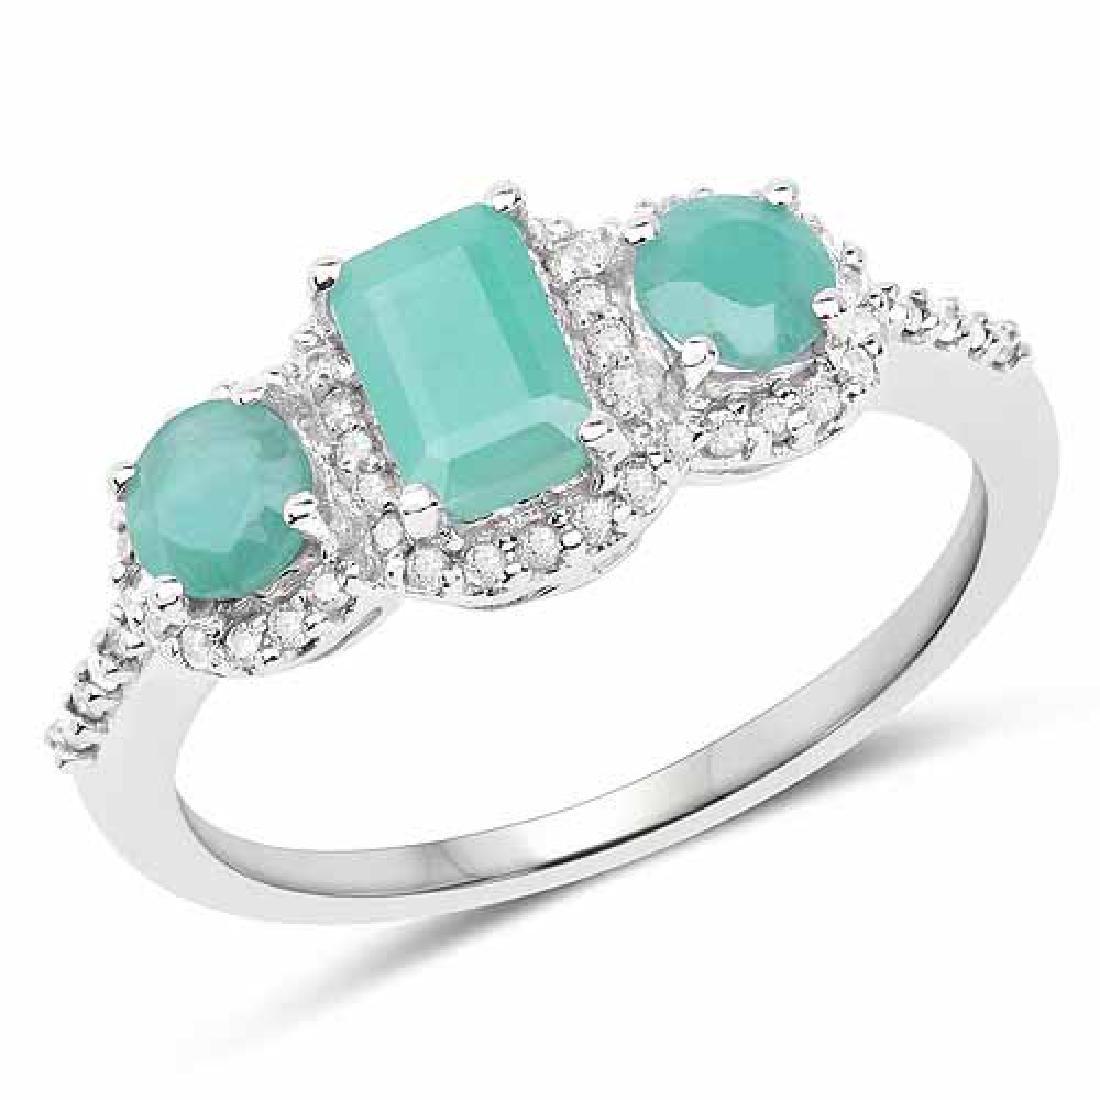 1.21 Carat Genuine Emerald and White Diamond 10K White